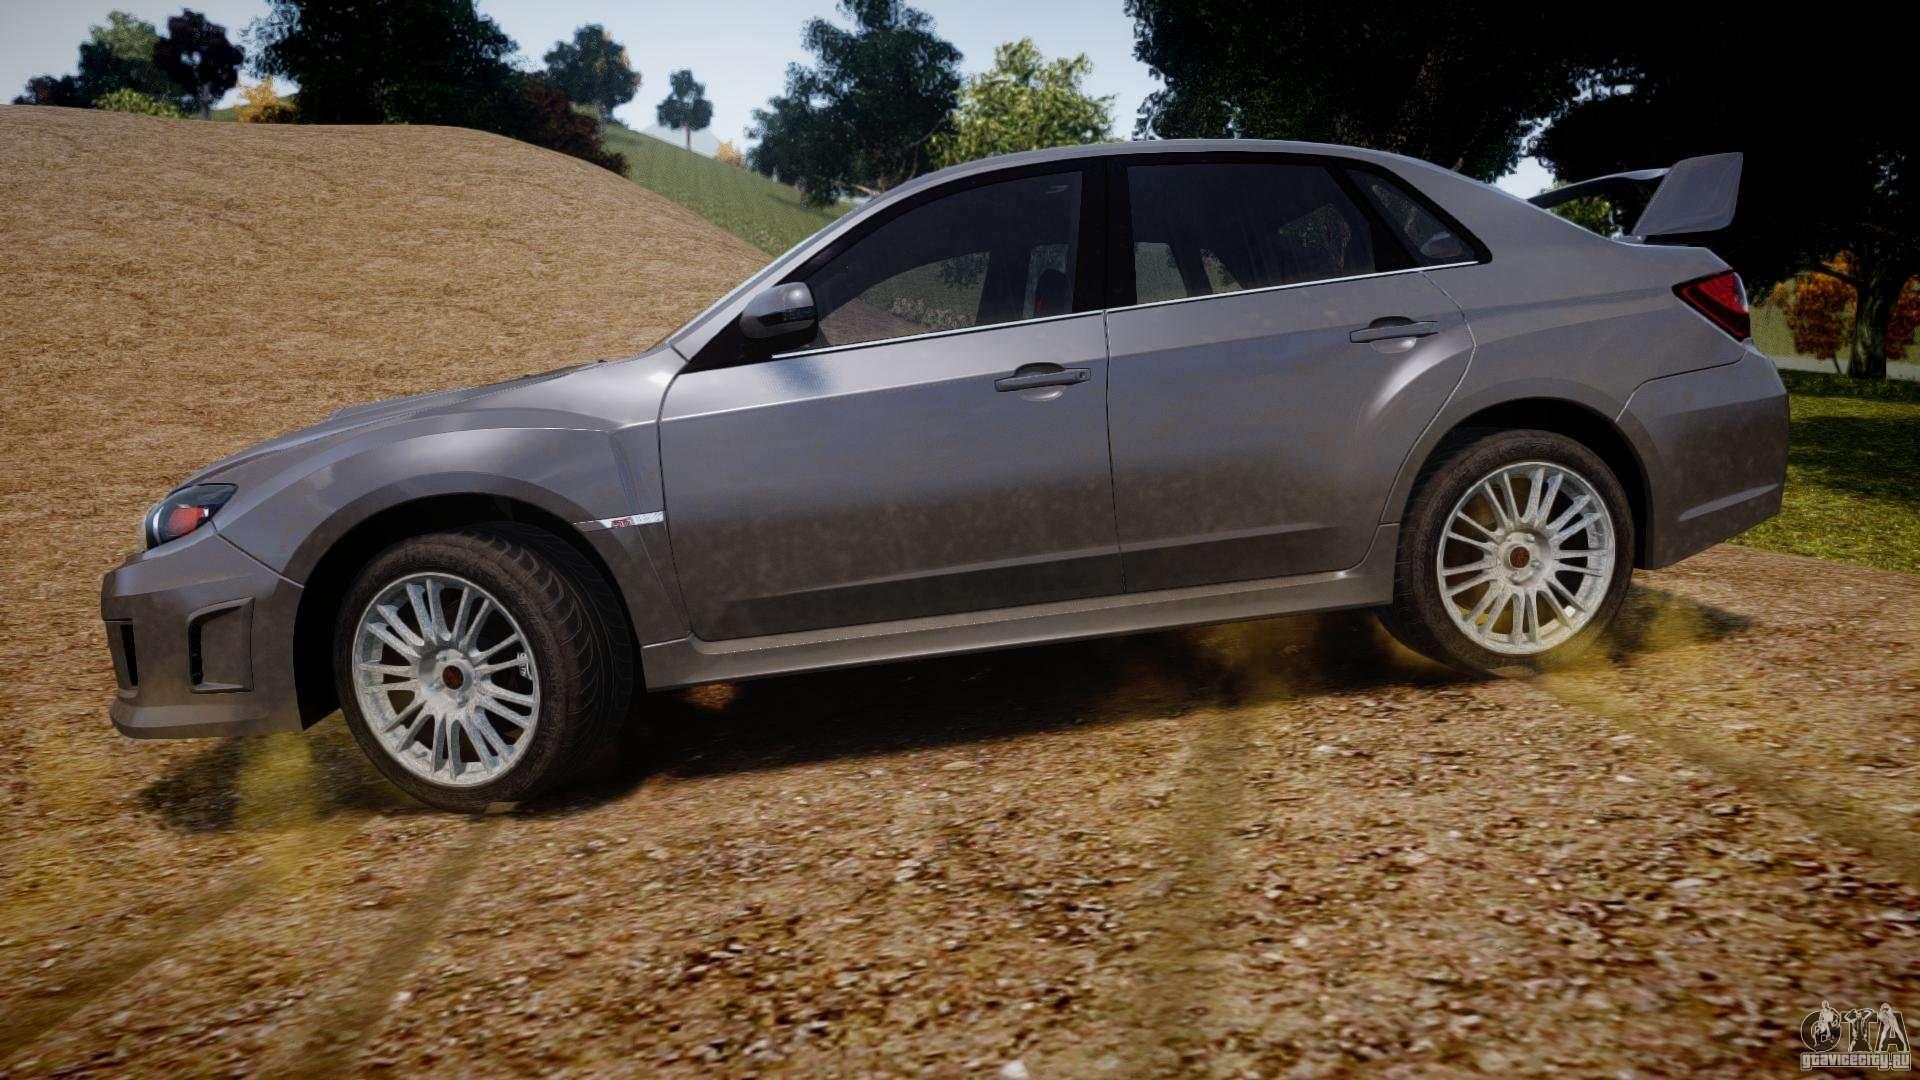 Subaru impreza sti cosworth cs400 2011 all 2016 eurovision song subaru impreza wrx sti 2011 for gta 4 interior vanachro Choice Image